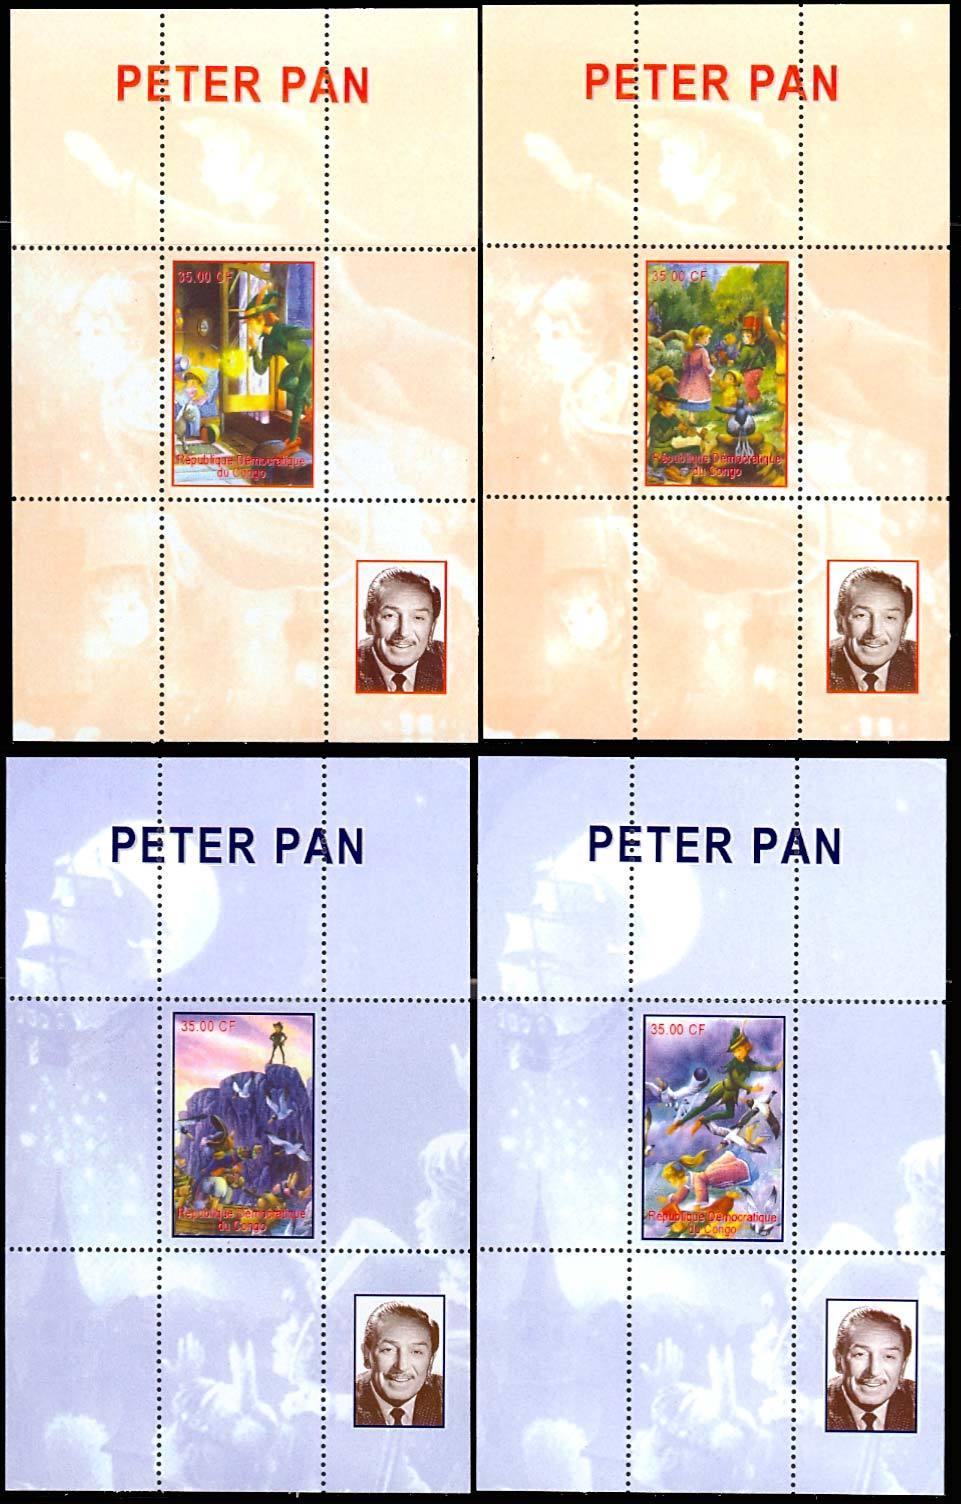 CONGO PETER PAN - SET OF FOUR SOUVENIR SHEETS - RARE!